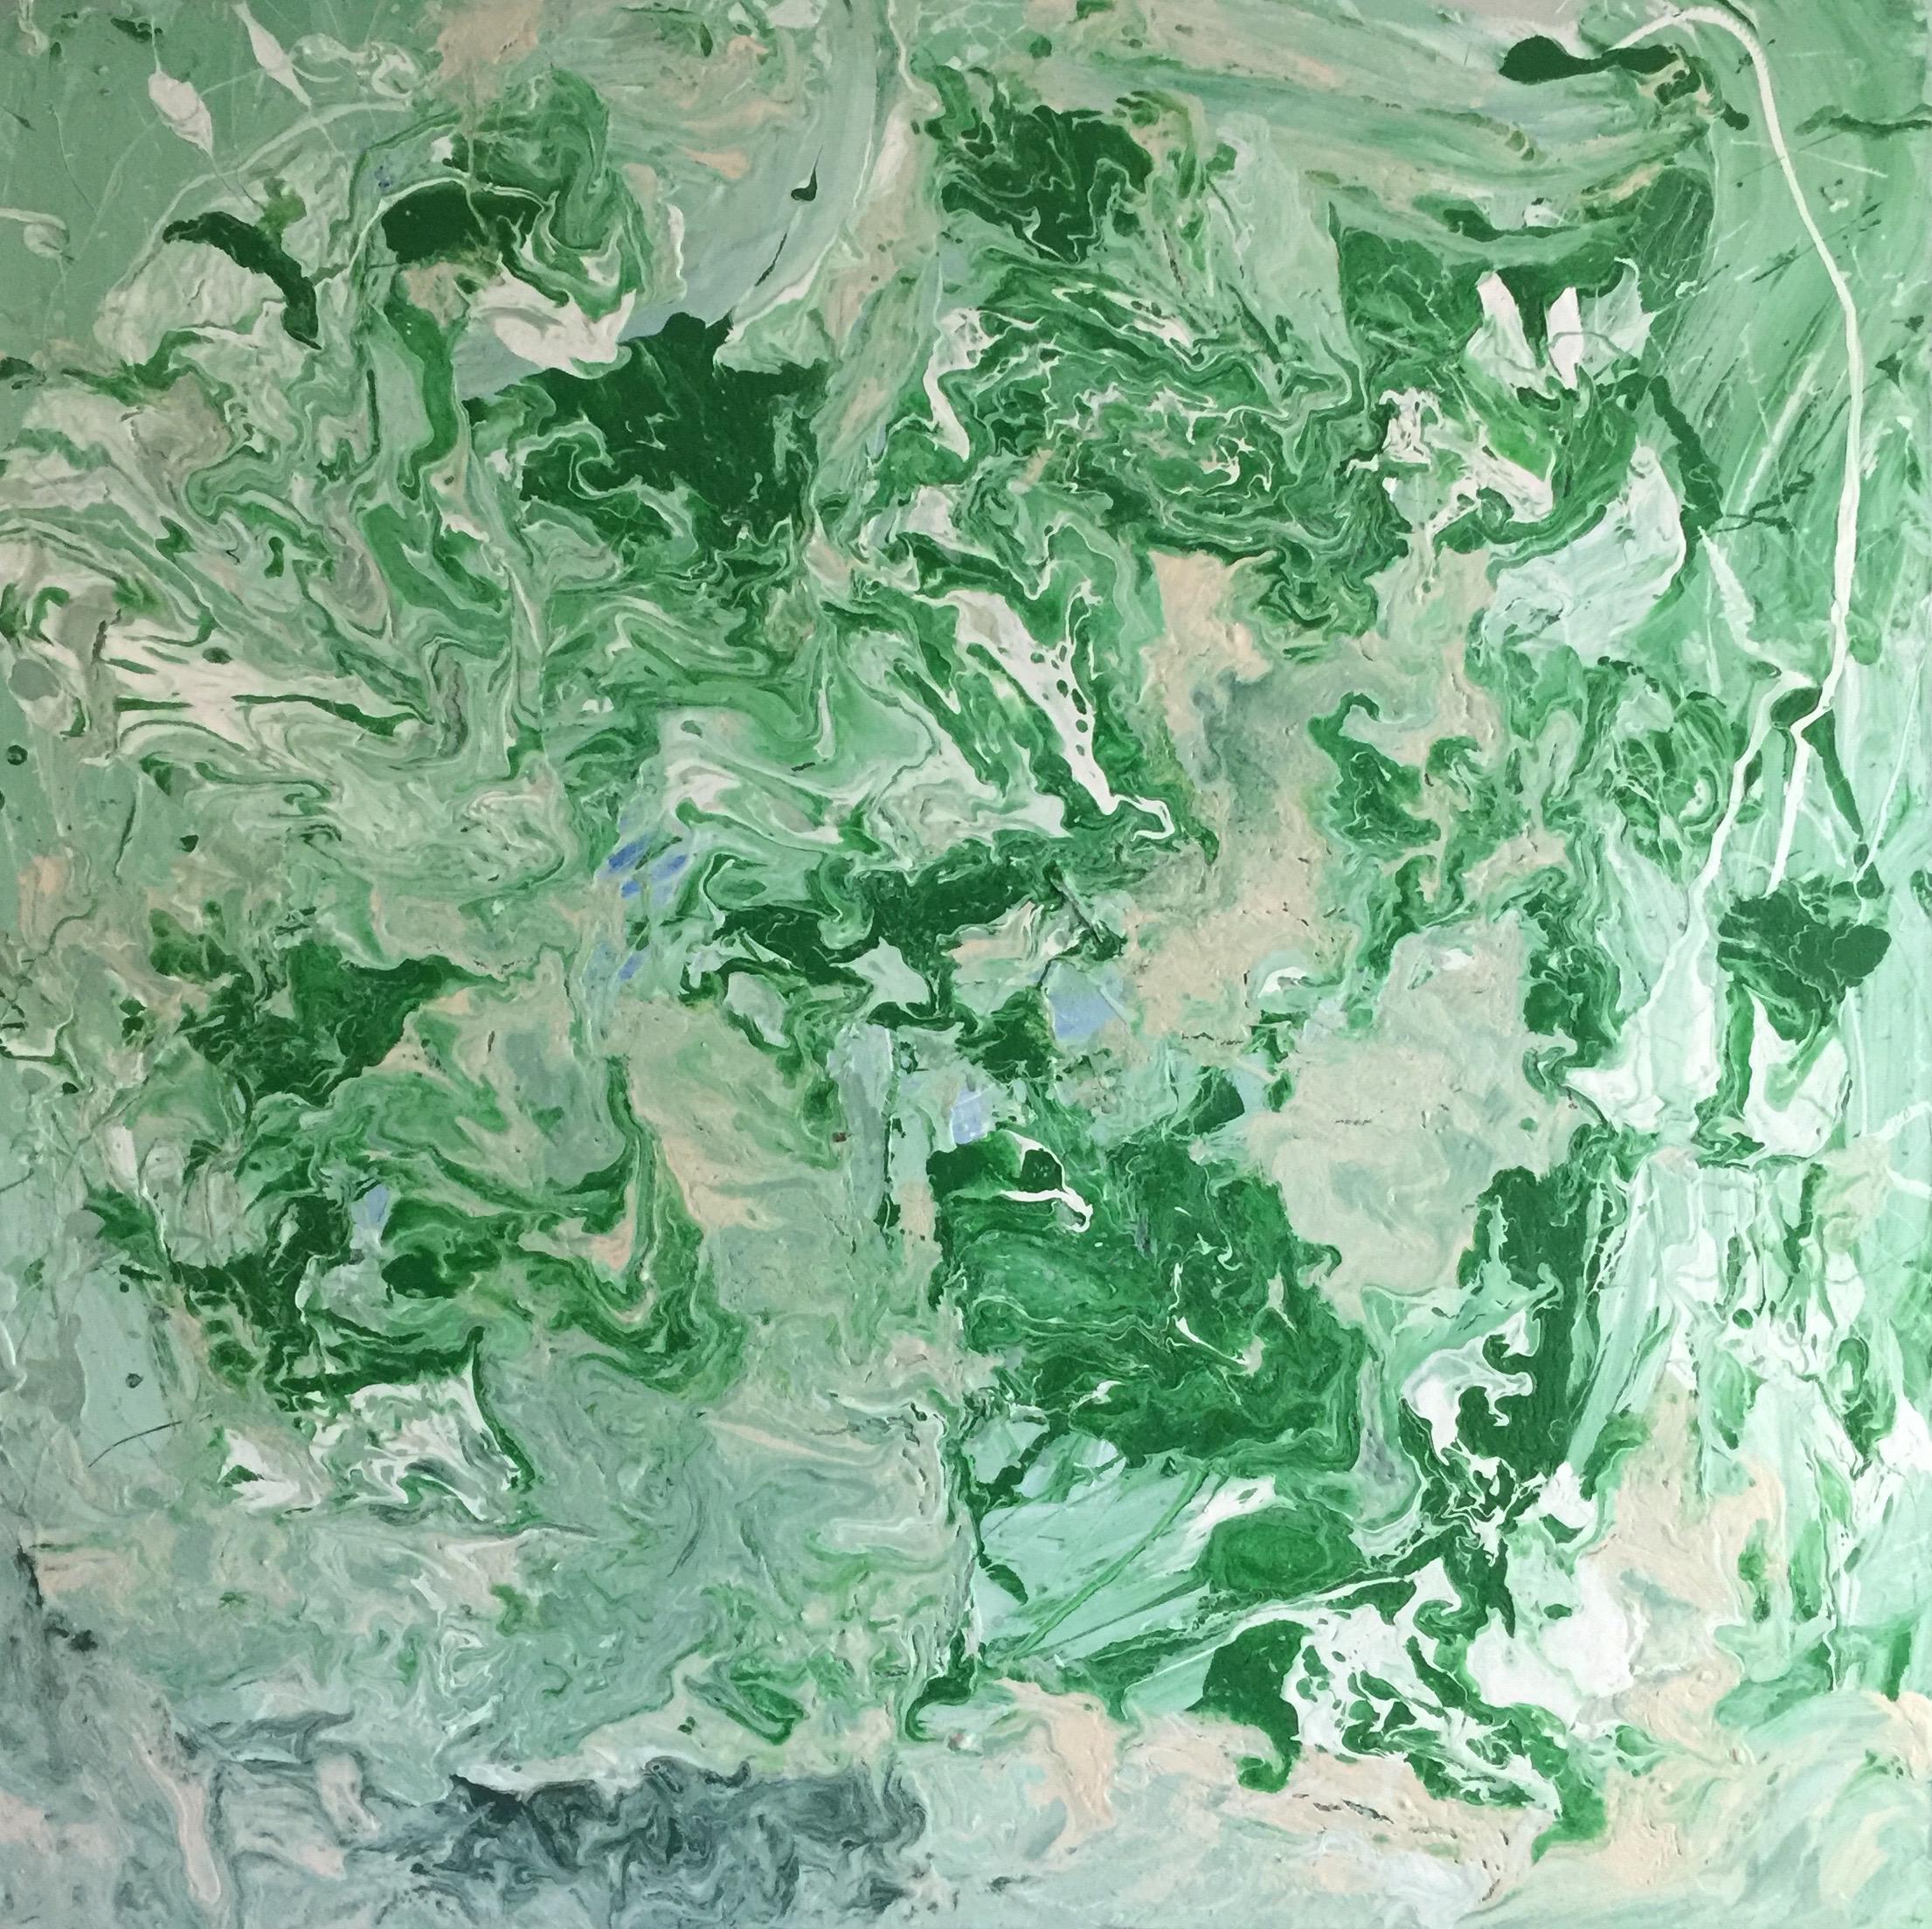 Untitled Green (Cambridge 2018)